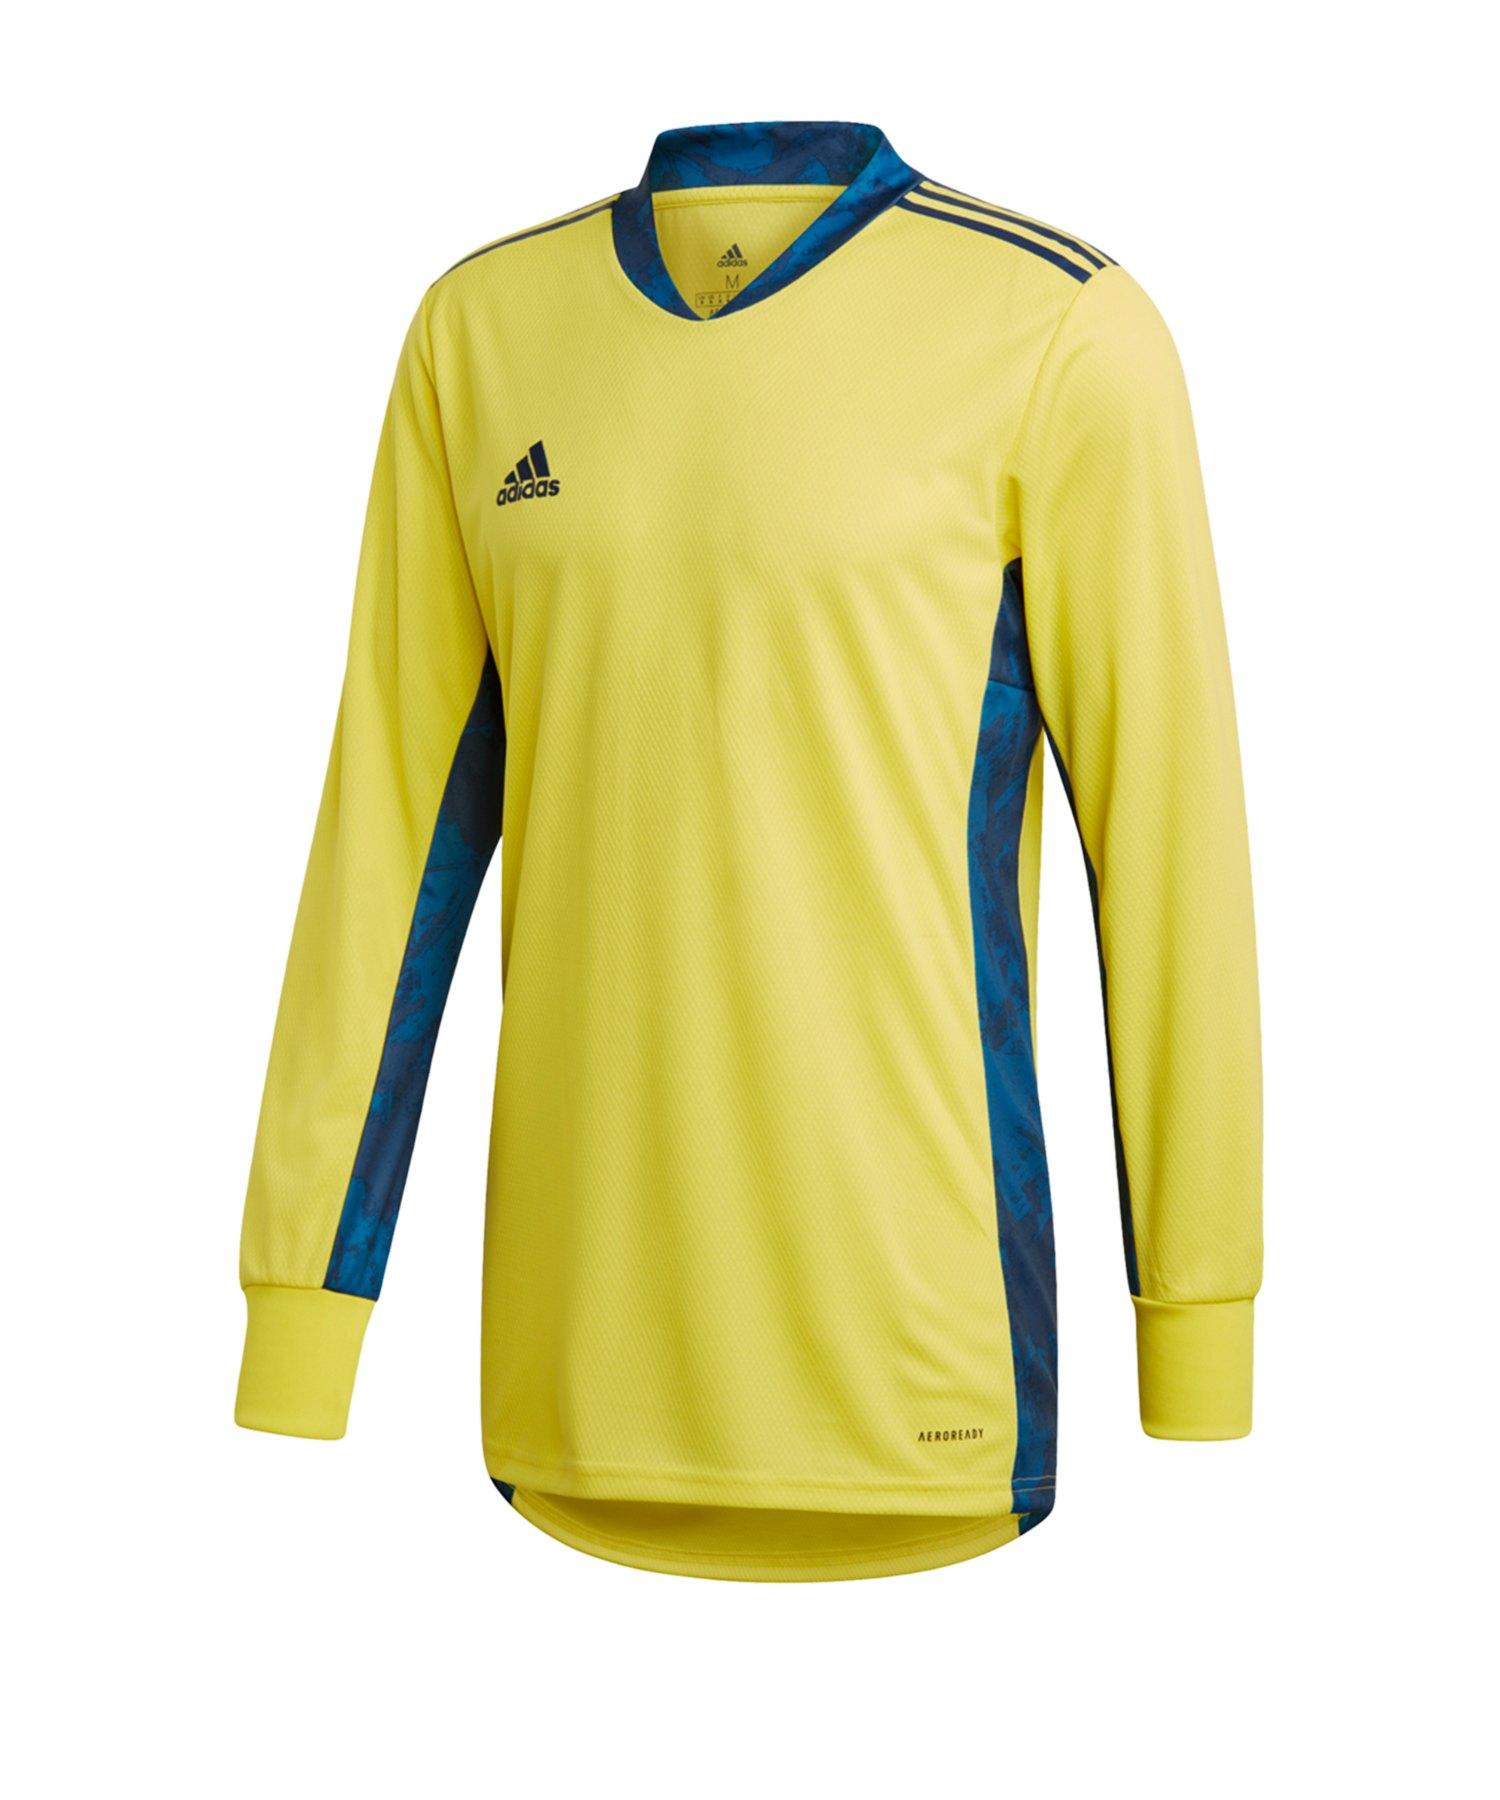 adidas AdiPro 20 Torwarttrikot langarm Gelb Blau - gelb